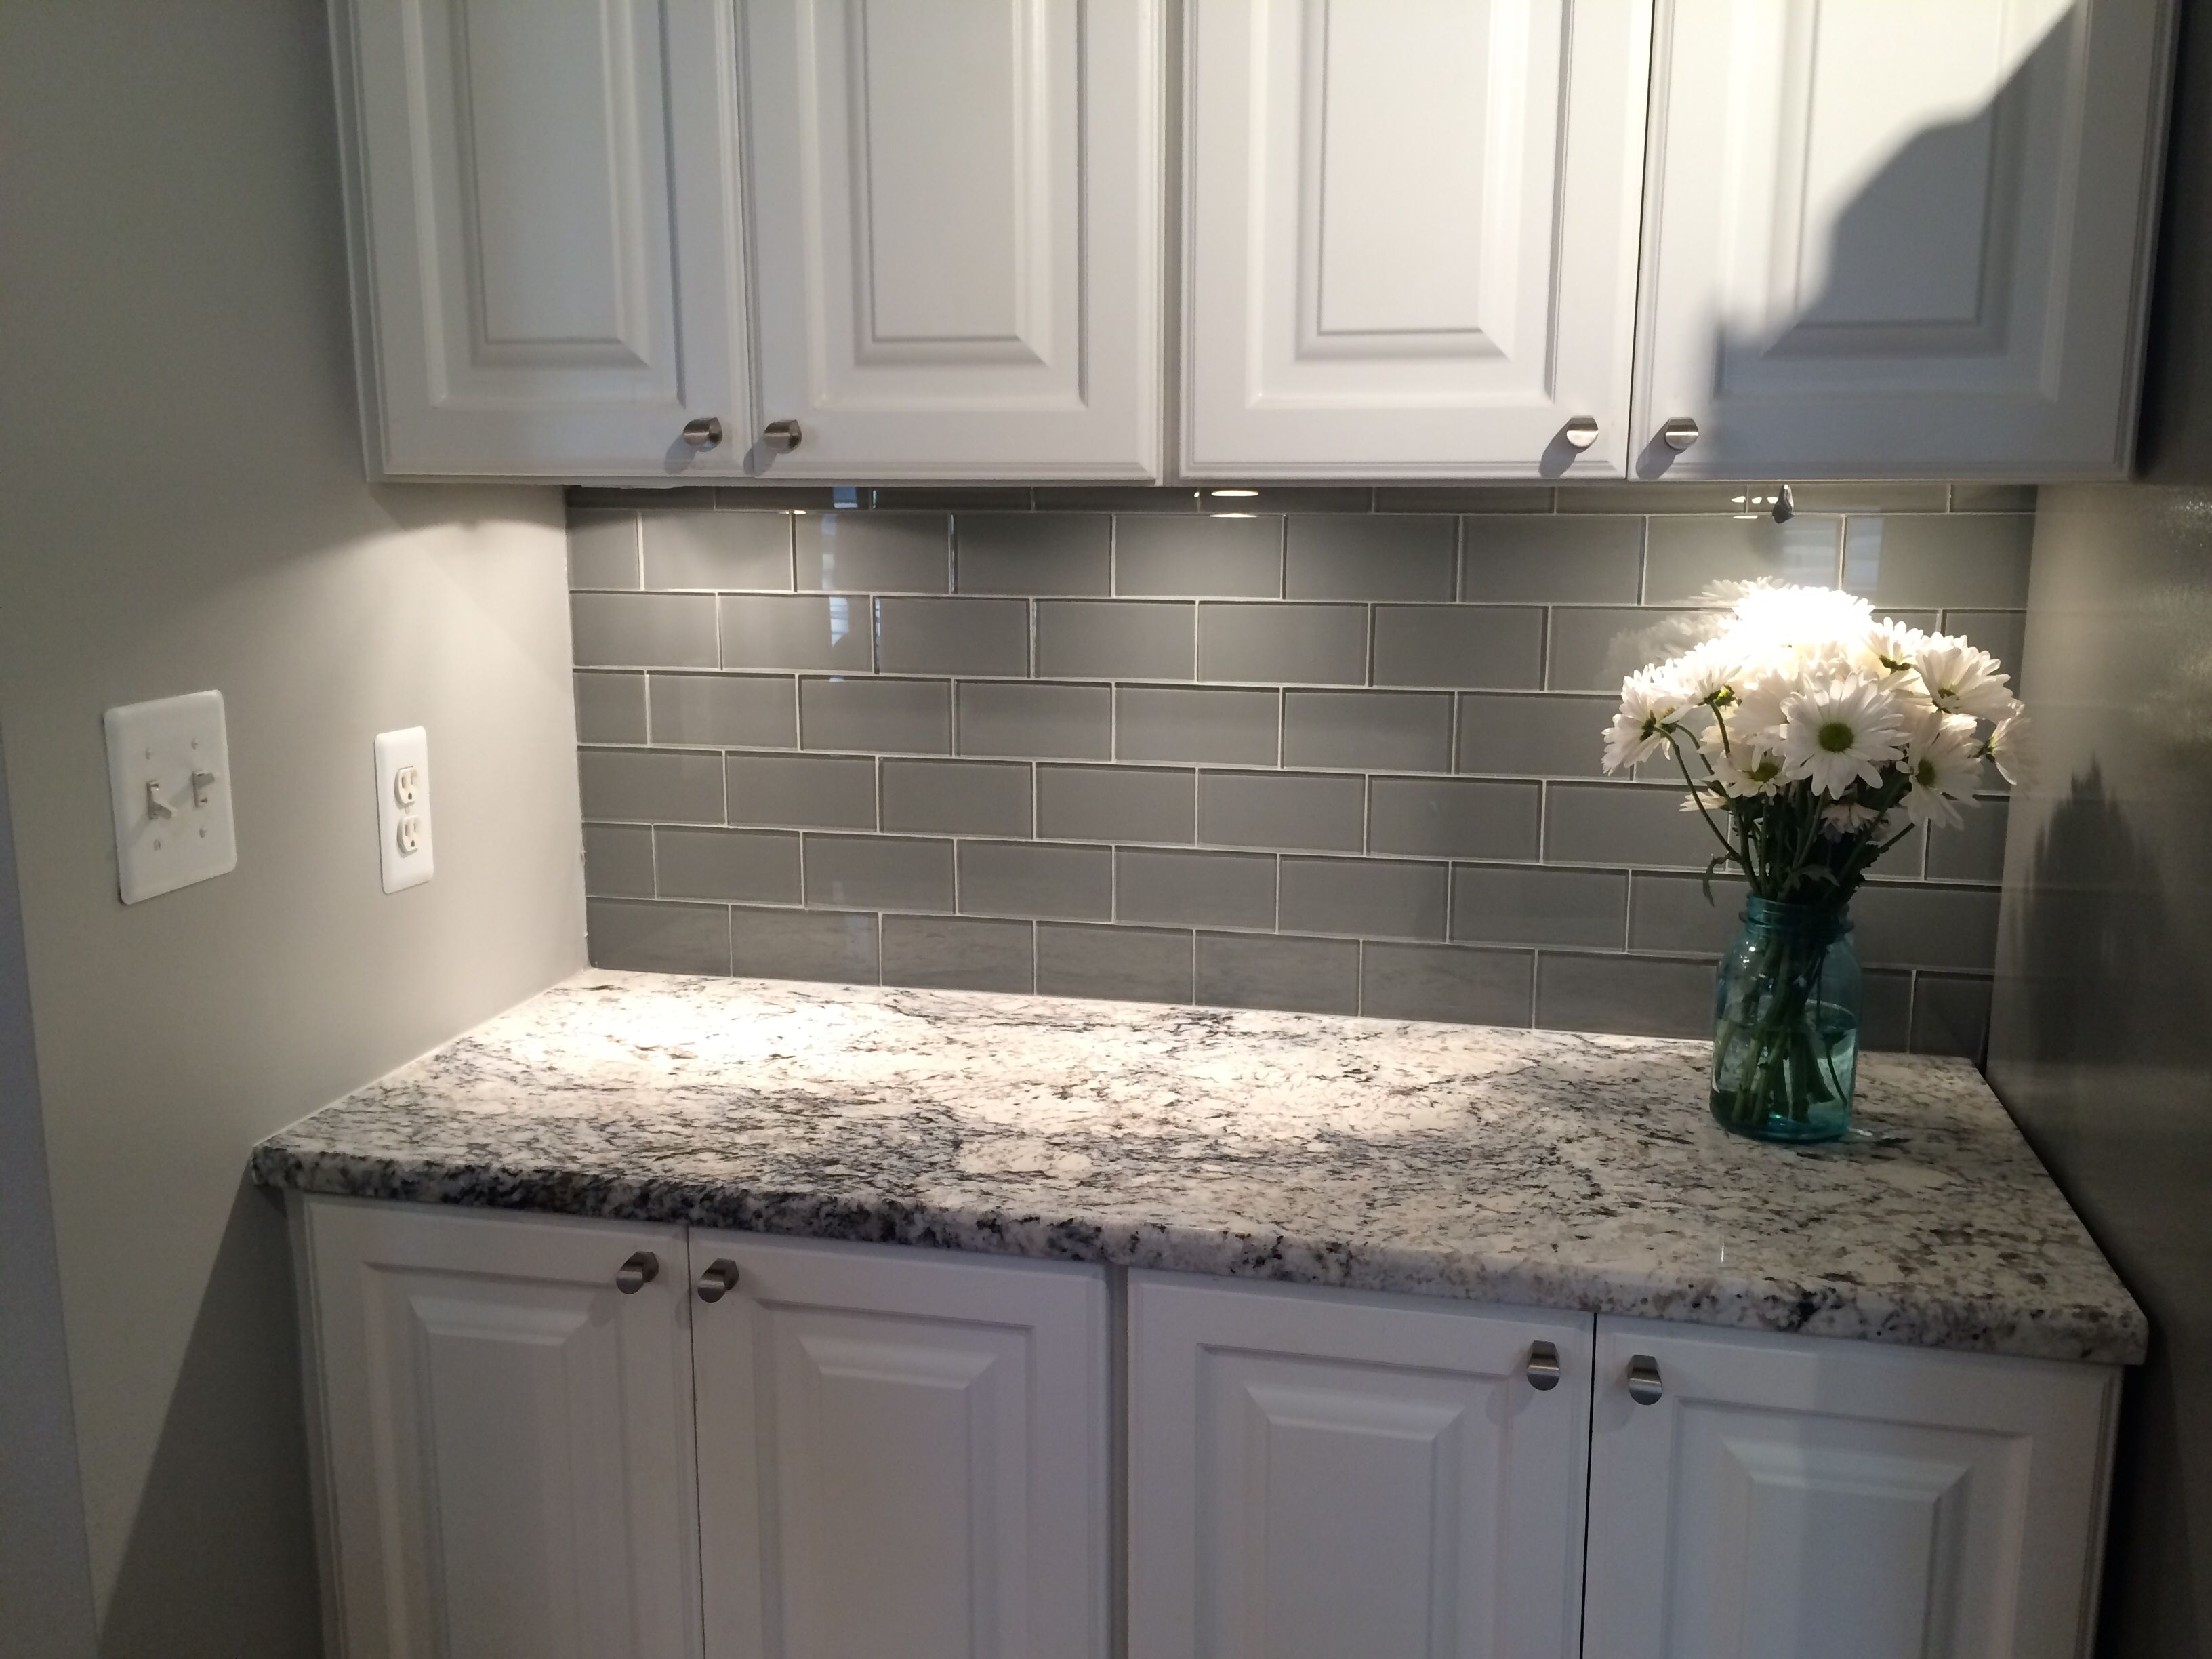 Grey Glass Subway Tile Backsplash And White Cabinet For ...